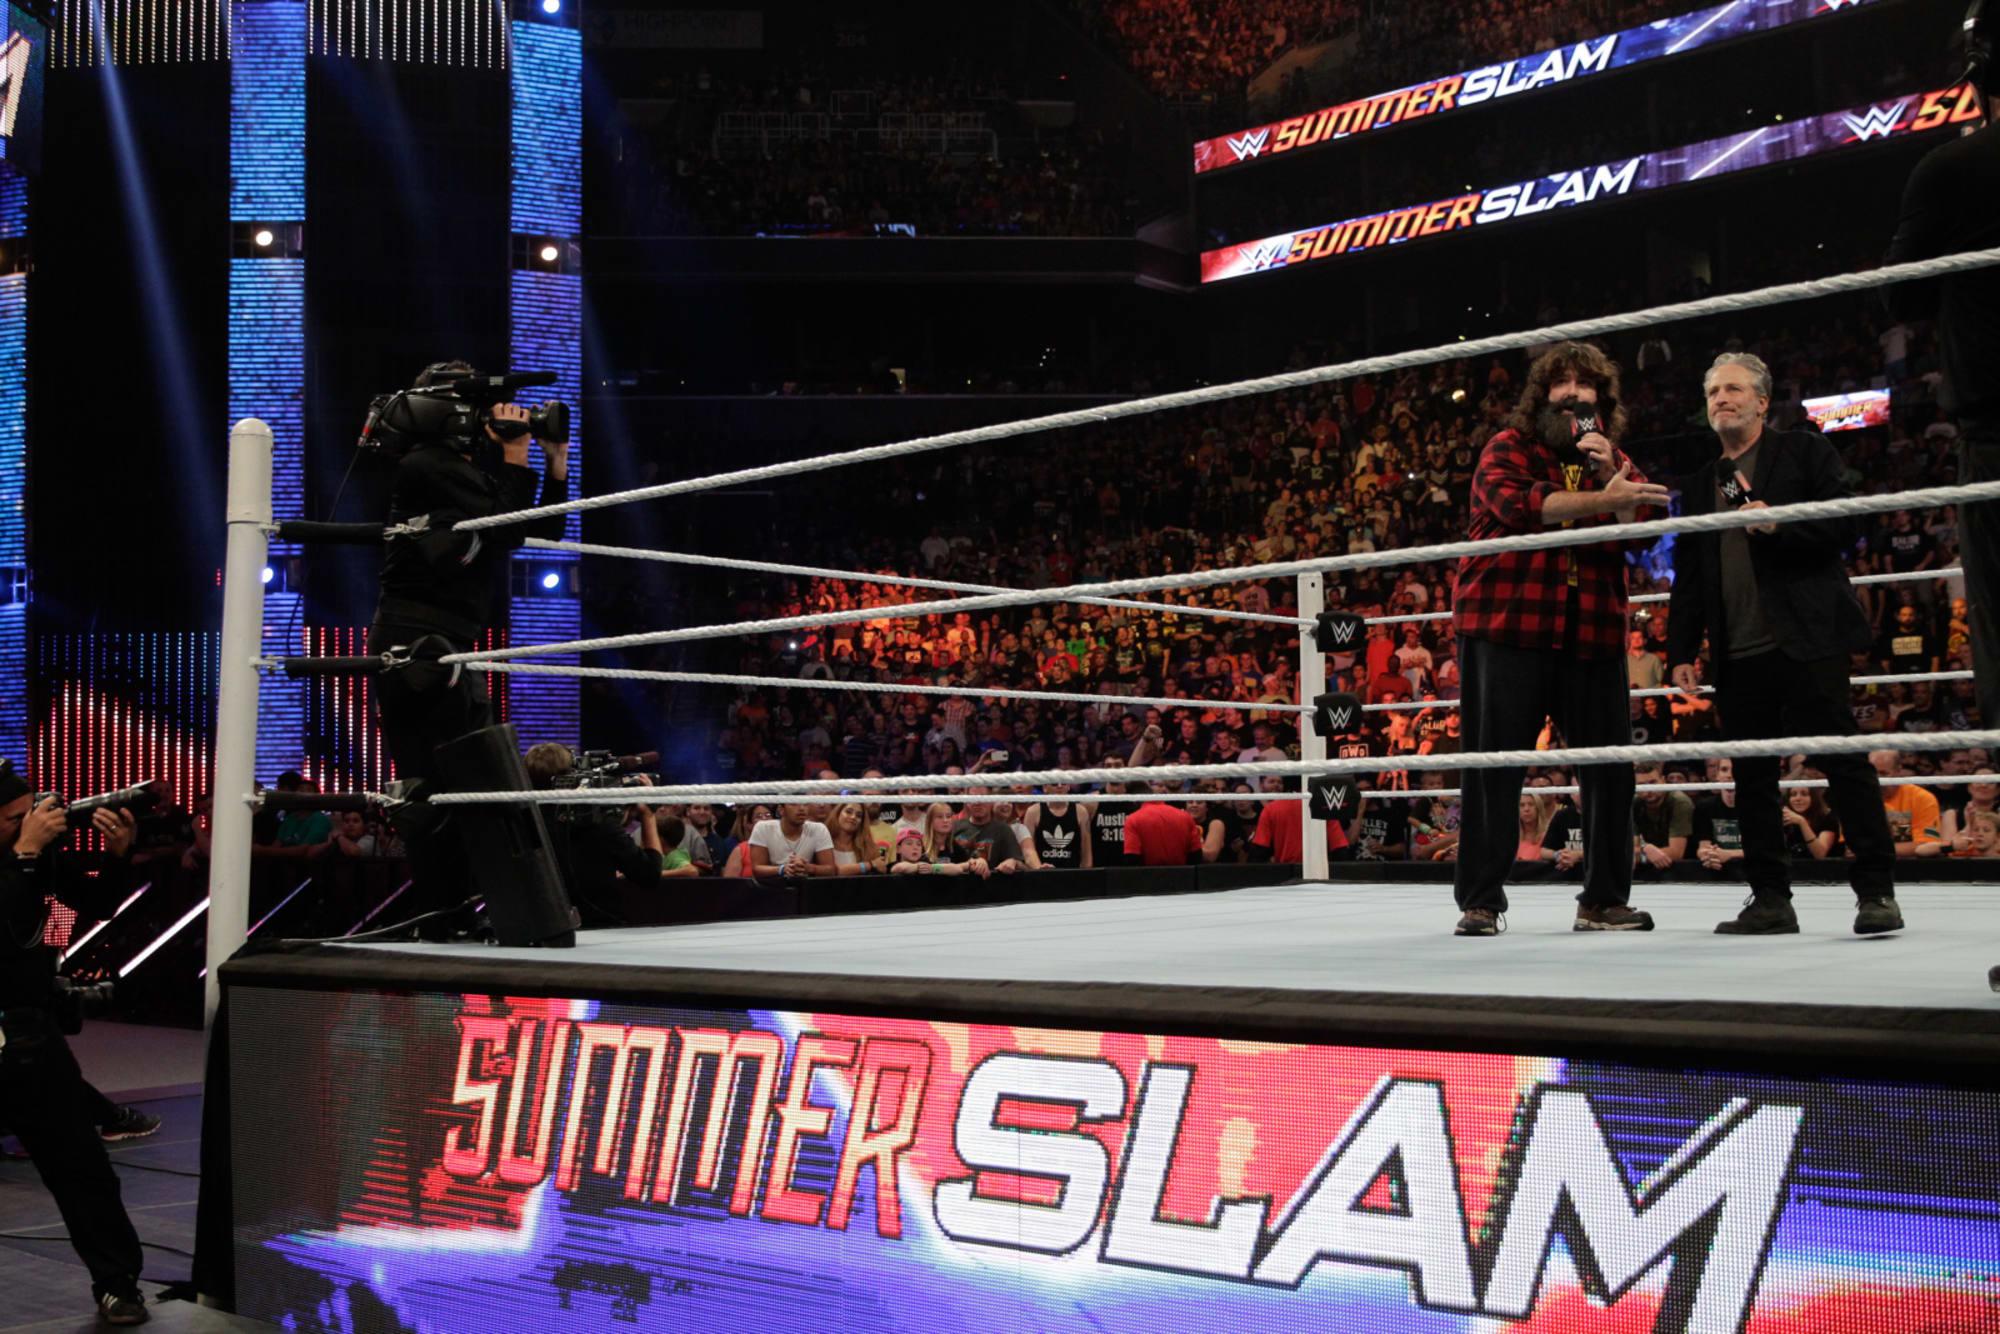 WWE is considering Las Vegas' Allegiant Stadium for SummerSlam 2021